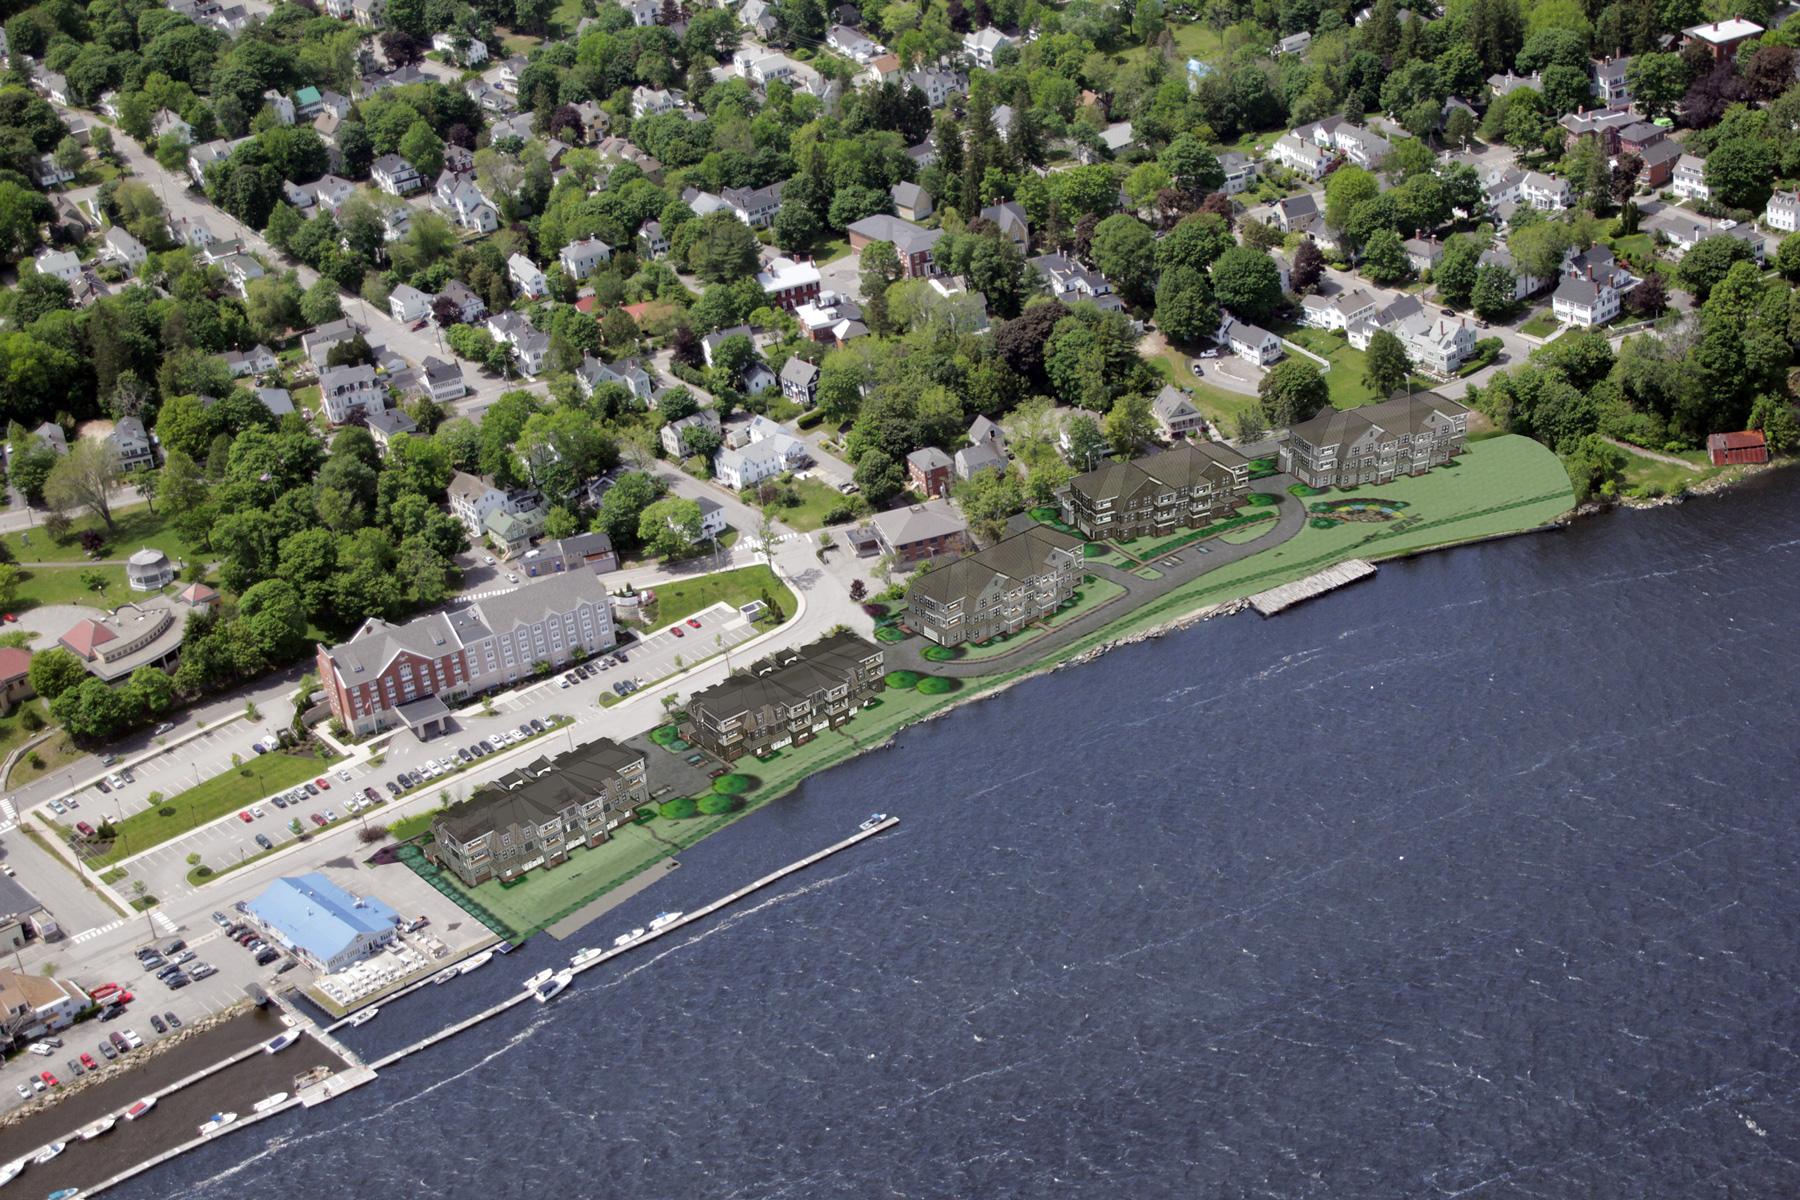 Condominium for Sale at 145 Commercial Street, #103 Bath, Maine, 04530 United States